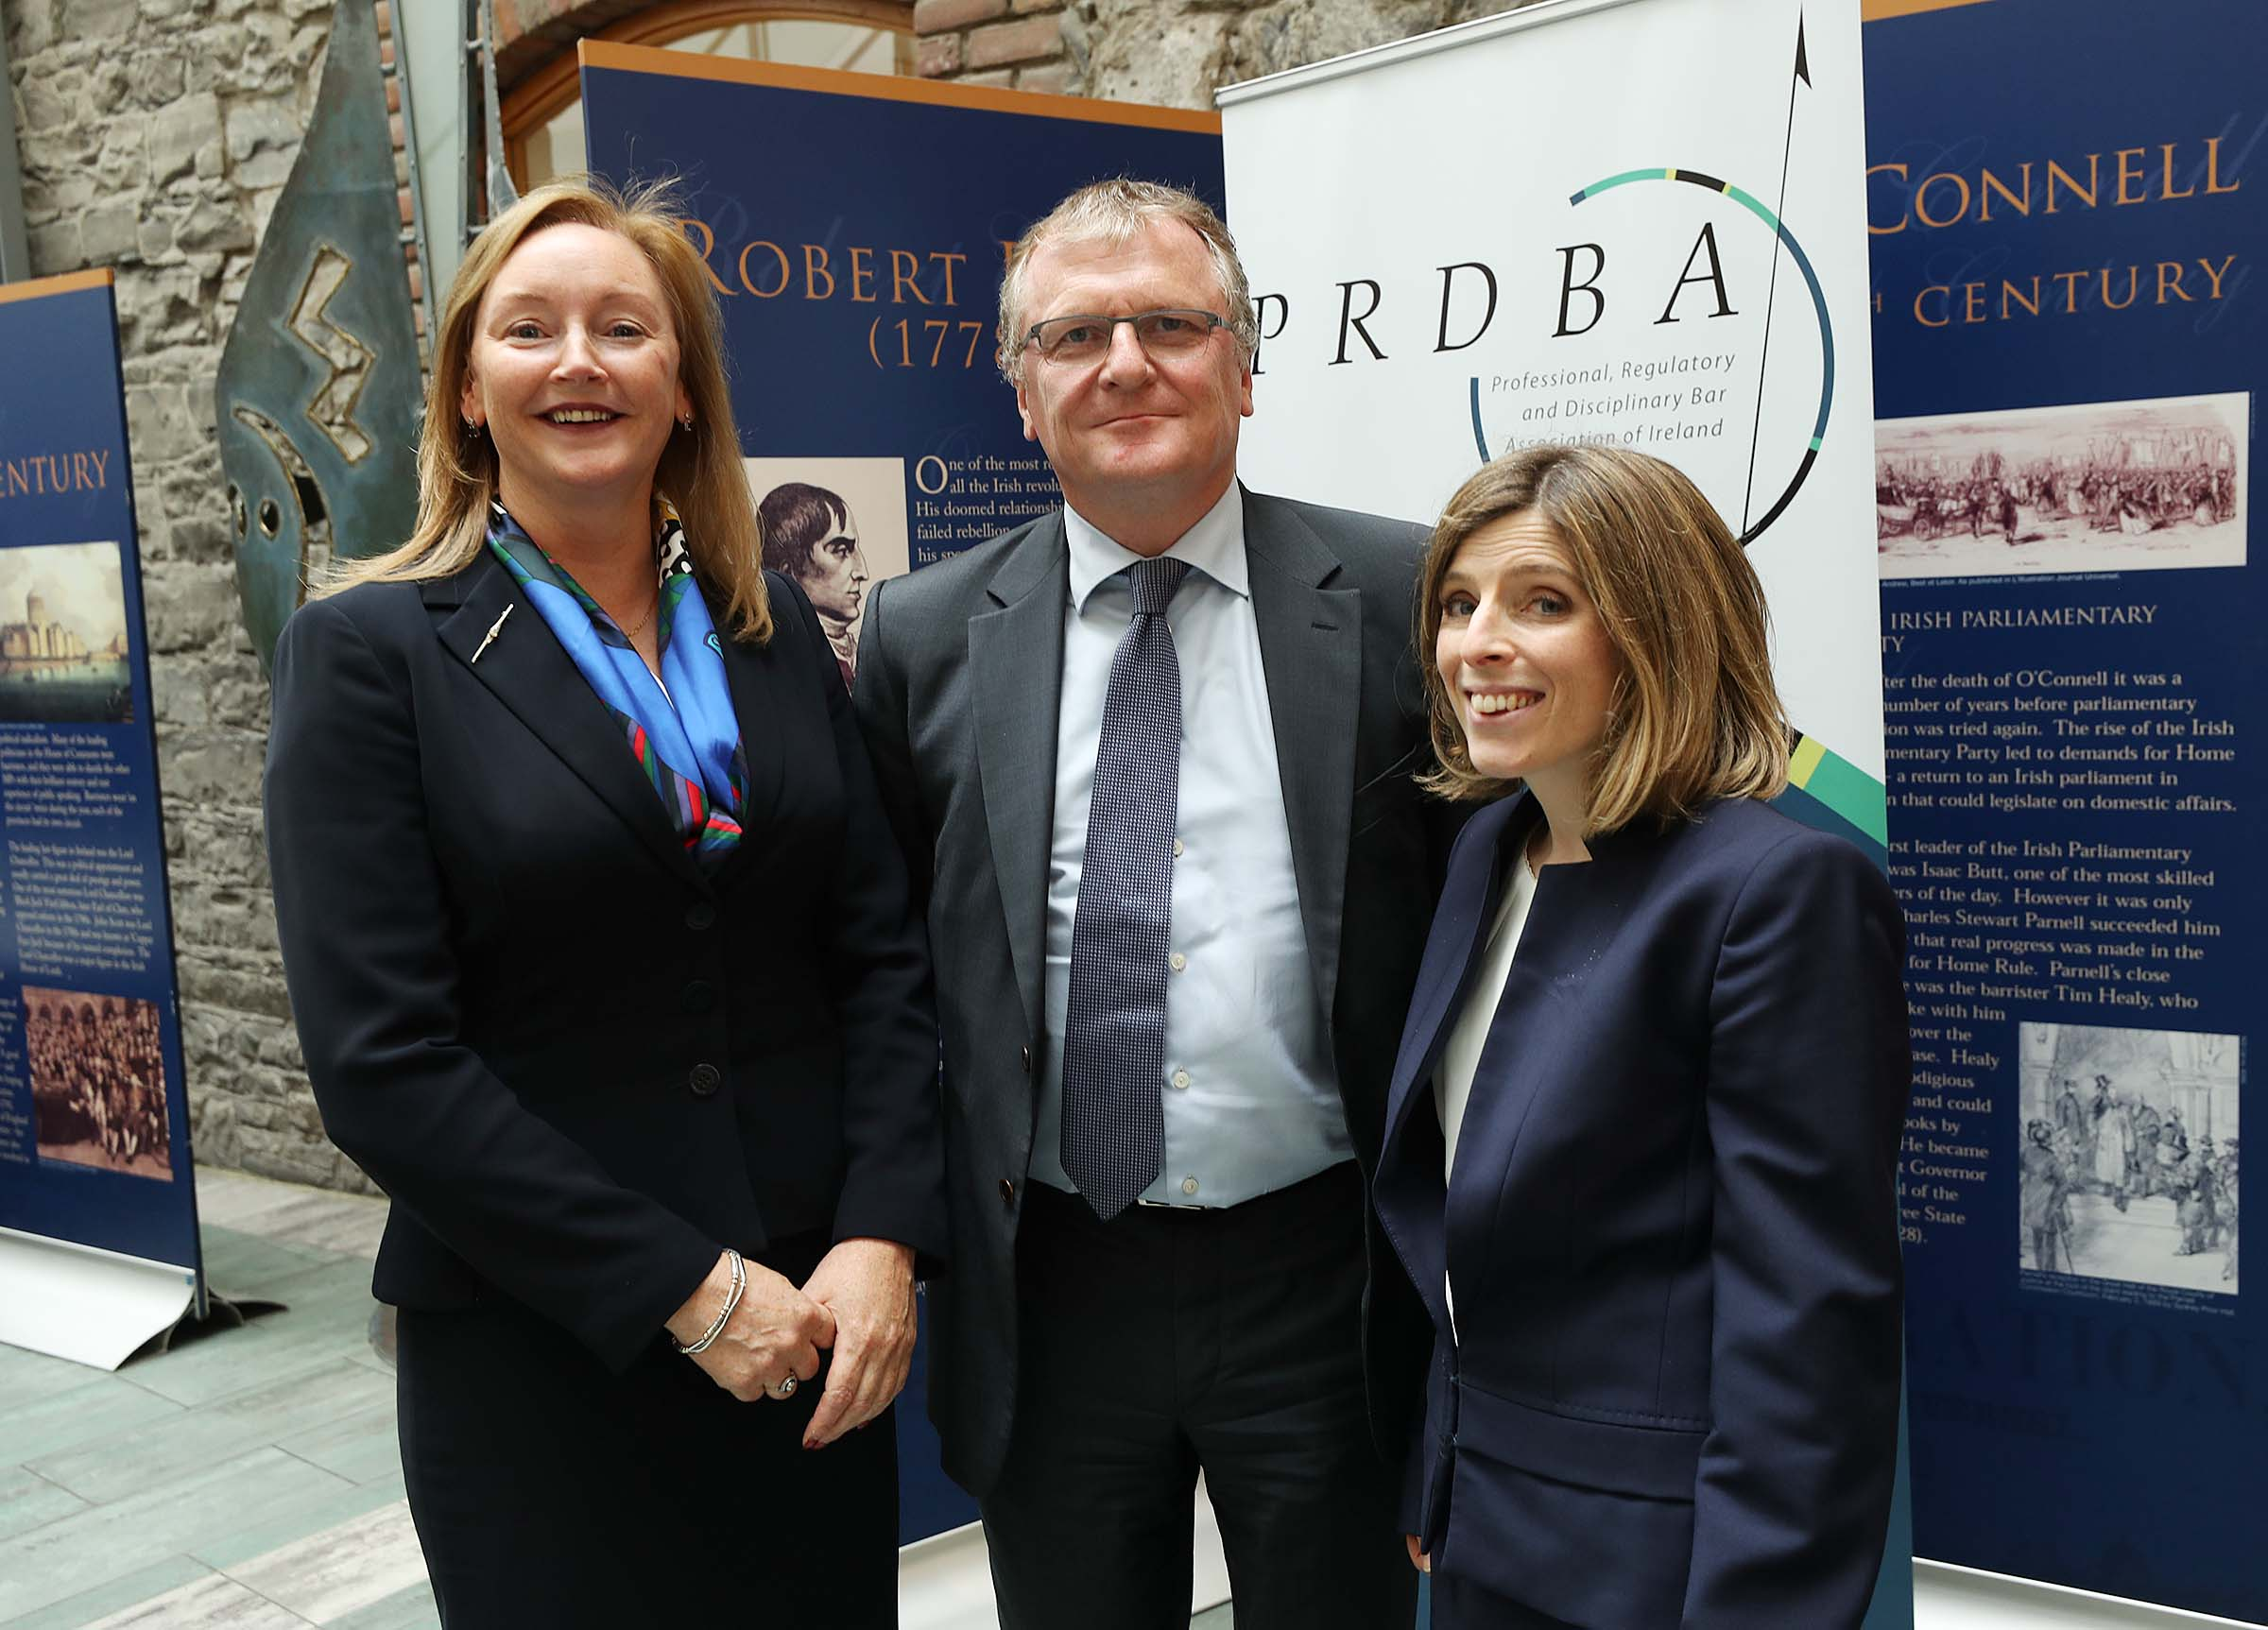 PRDBA Past Events